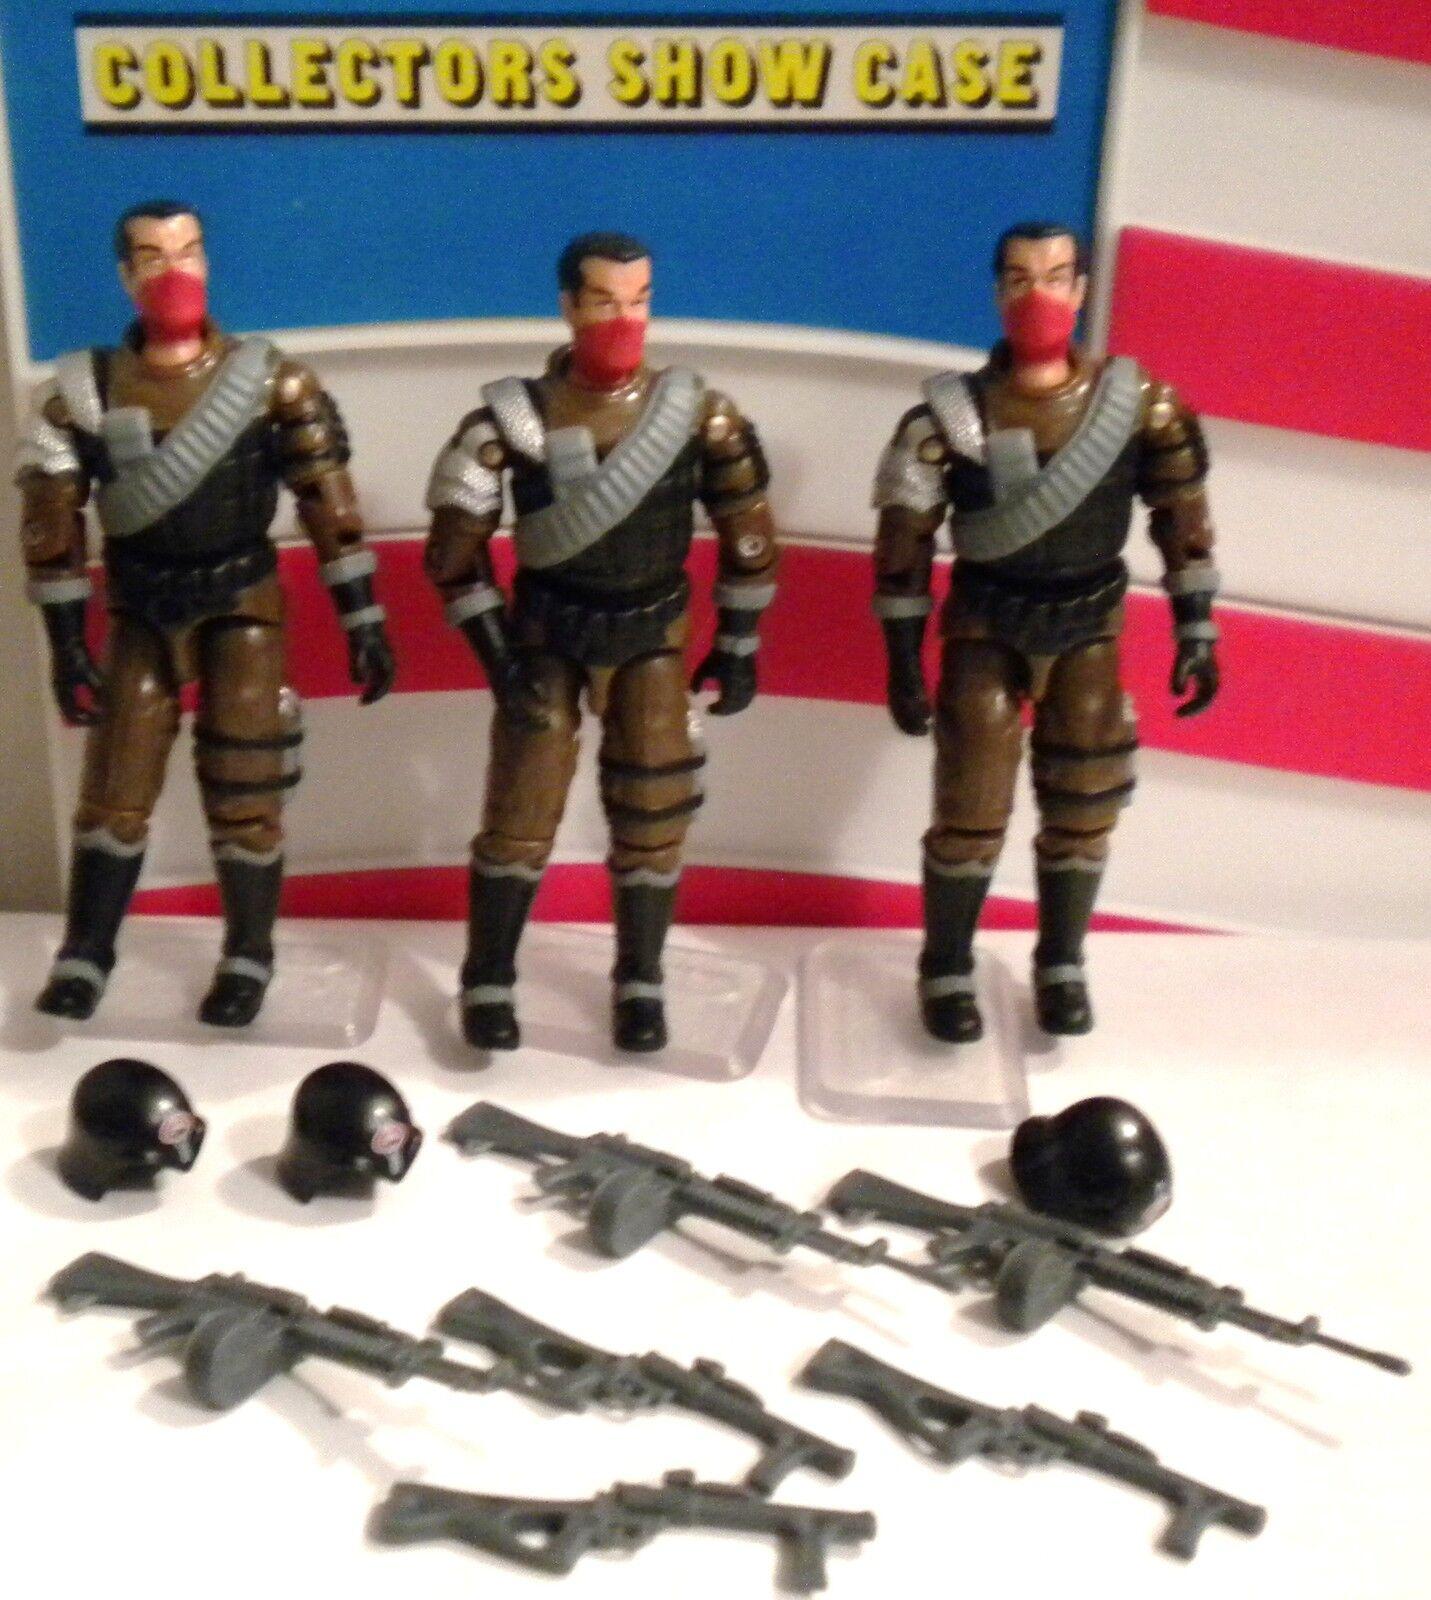 GI JOE  3 SKULL SKULL SKULL SQUAD TROOPERS 2006 CONVENTION  ARMY blueDD  100% JOECON 539460